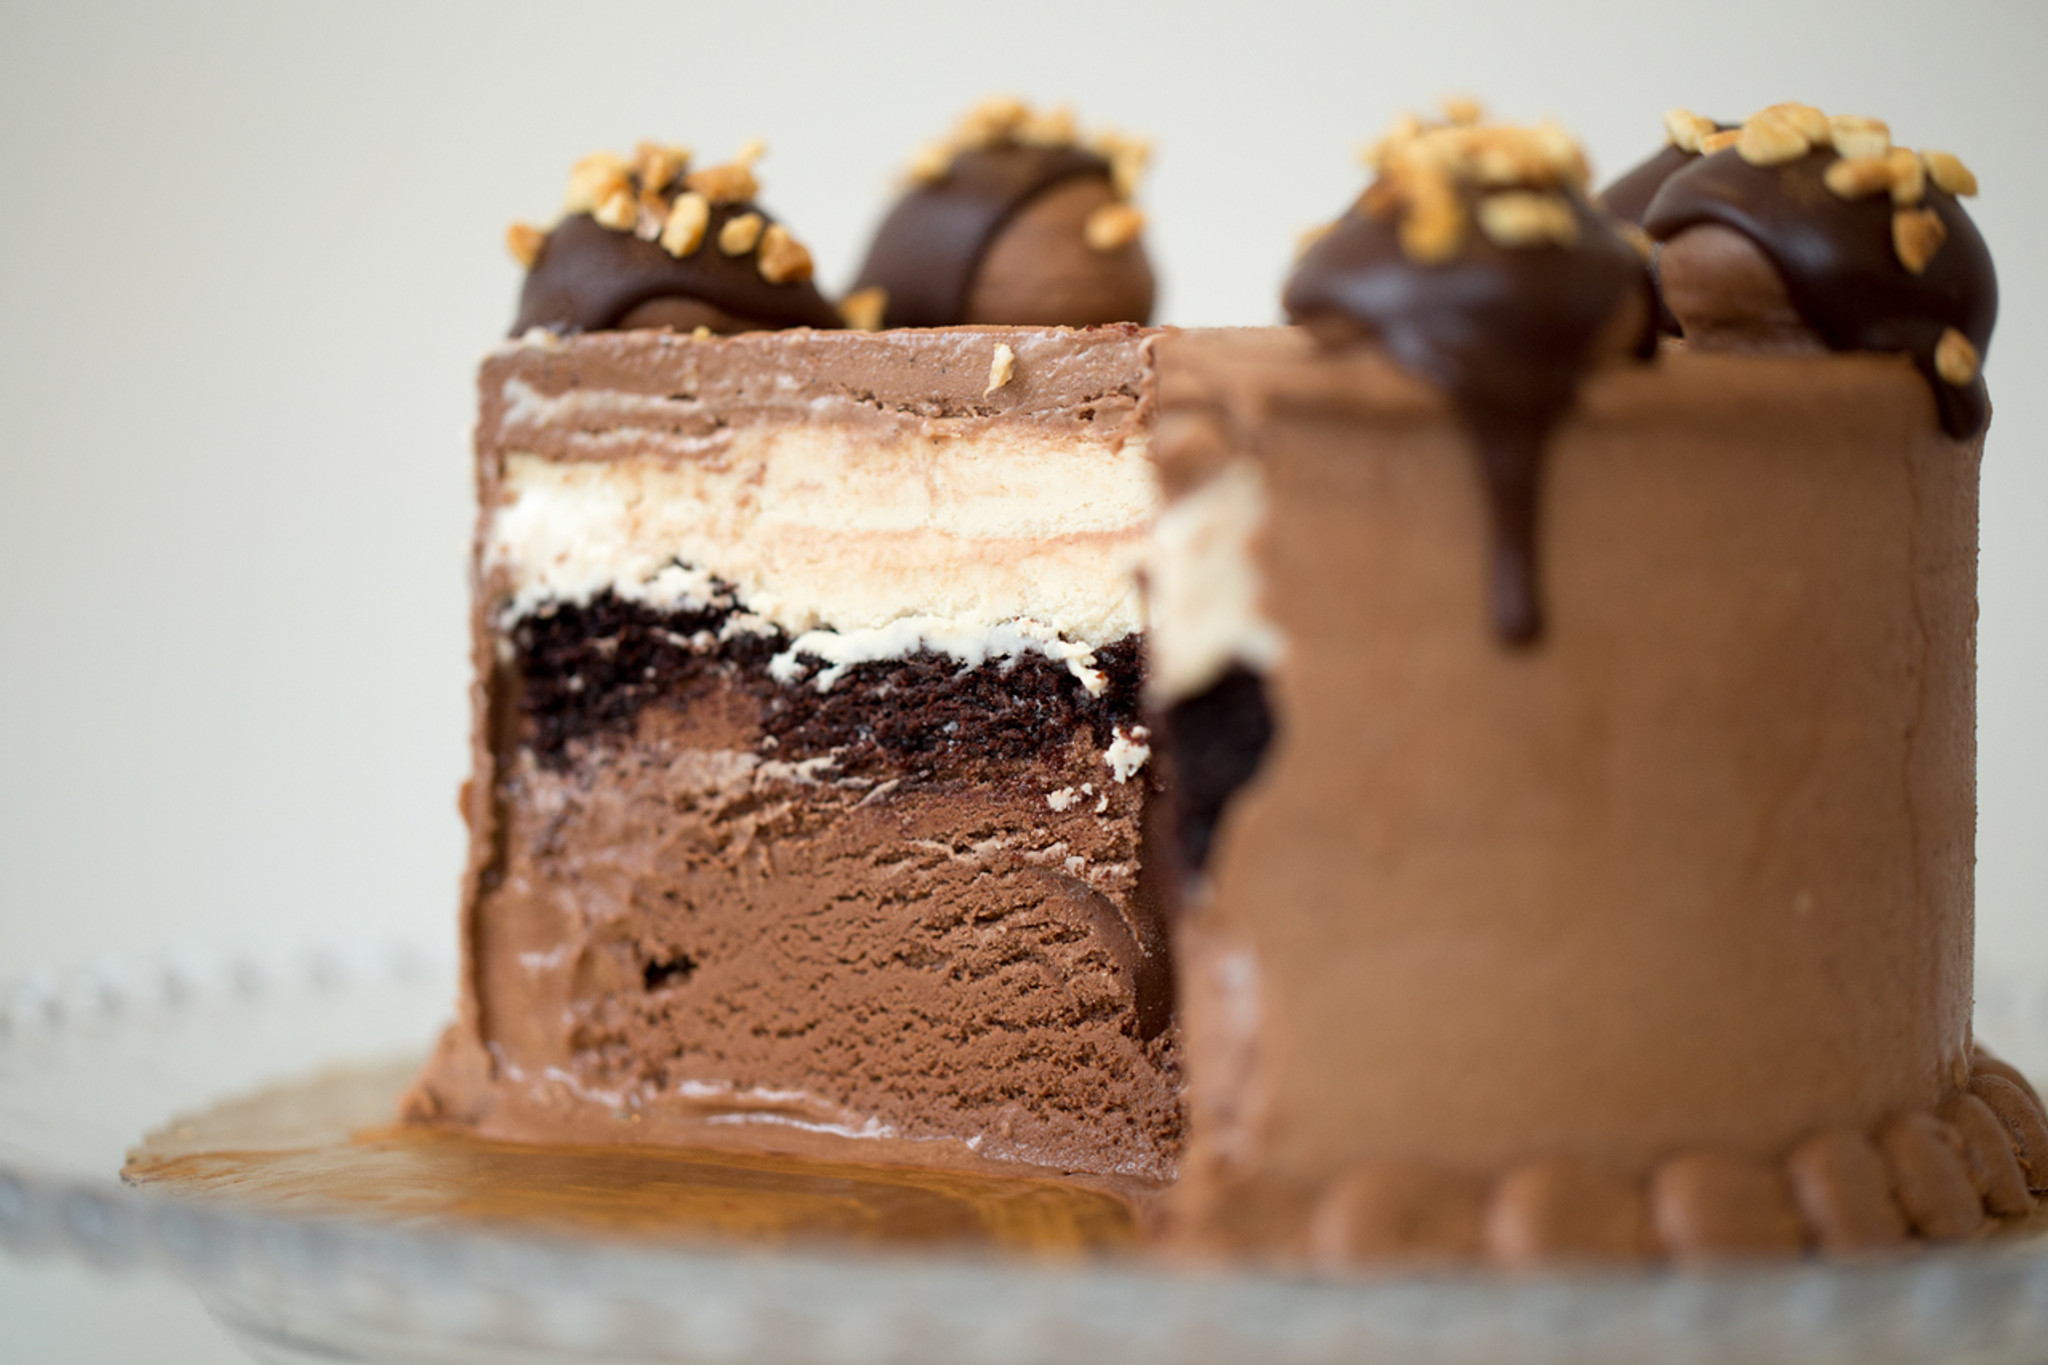 Custom Ice Cream Cake FoMu Ice Cream